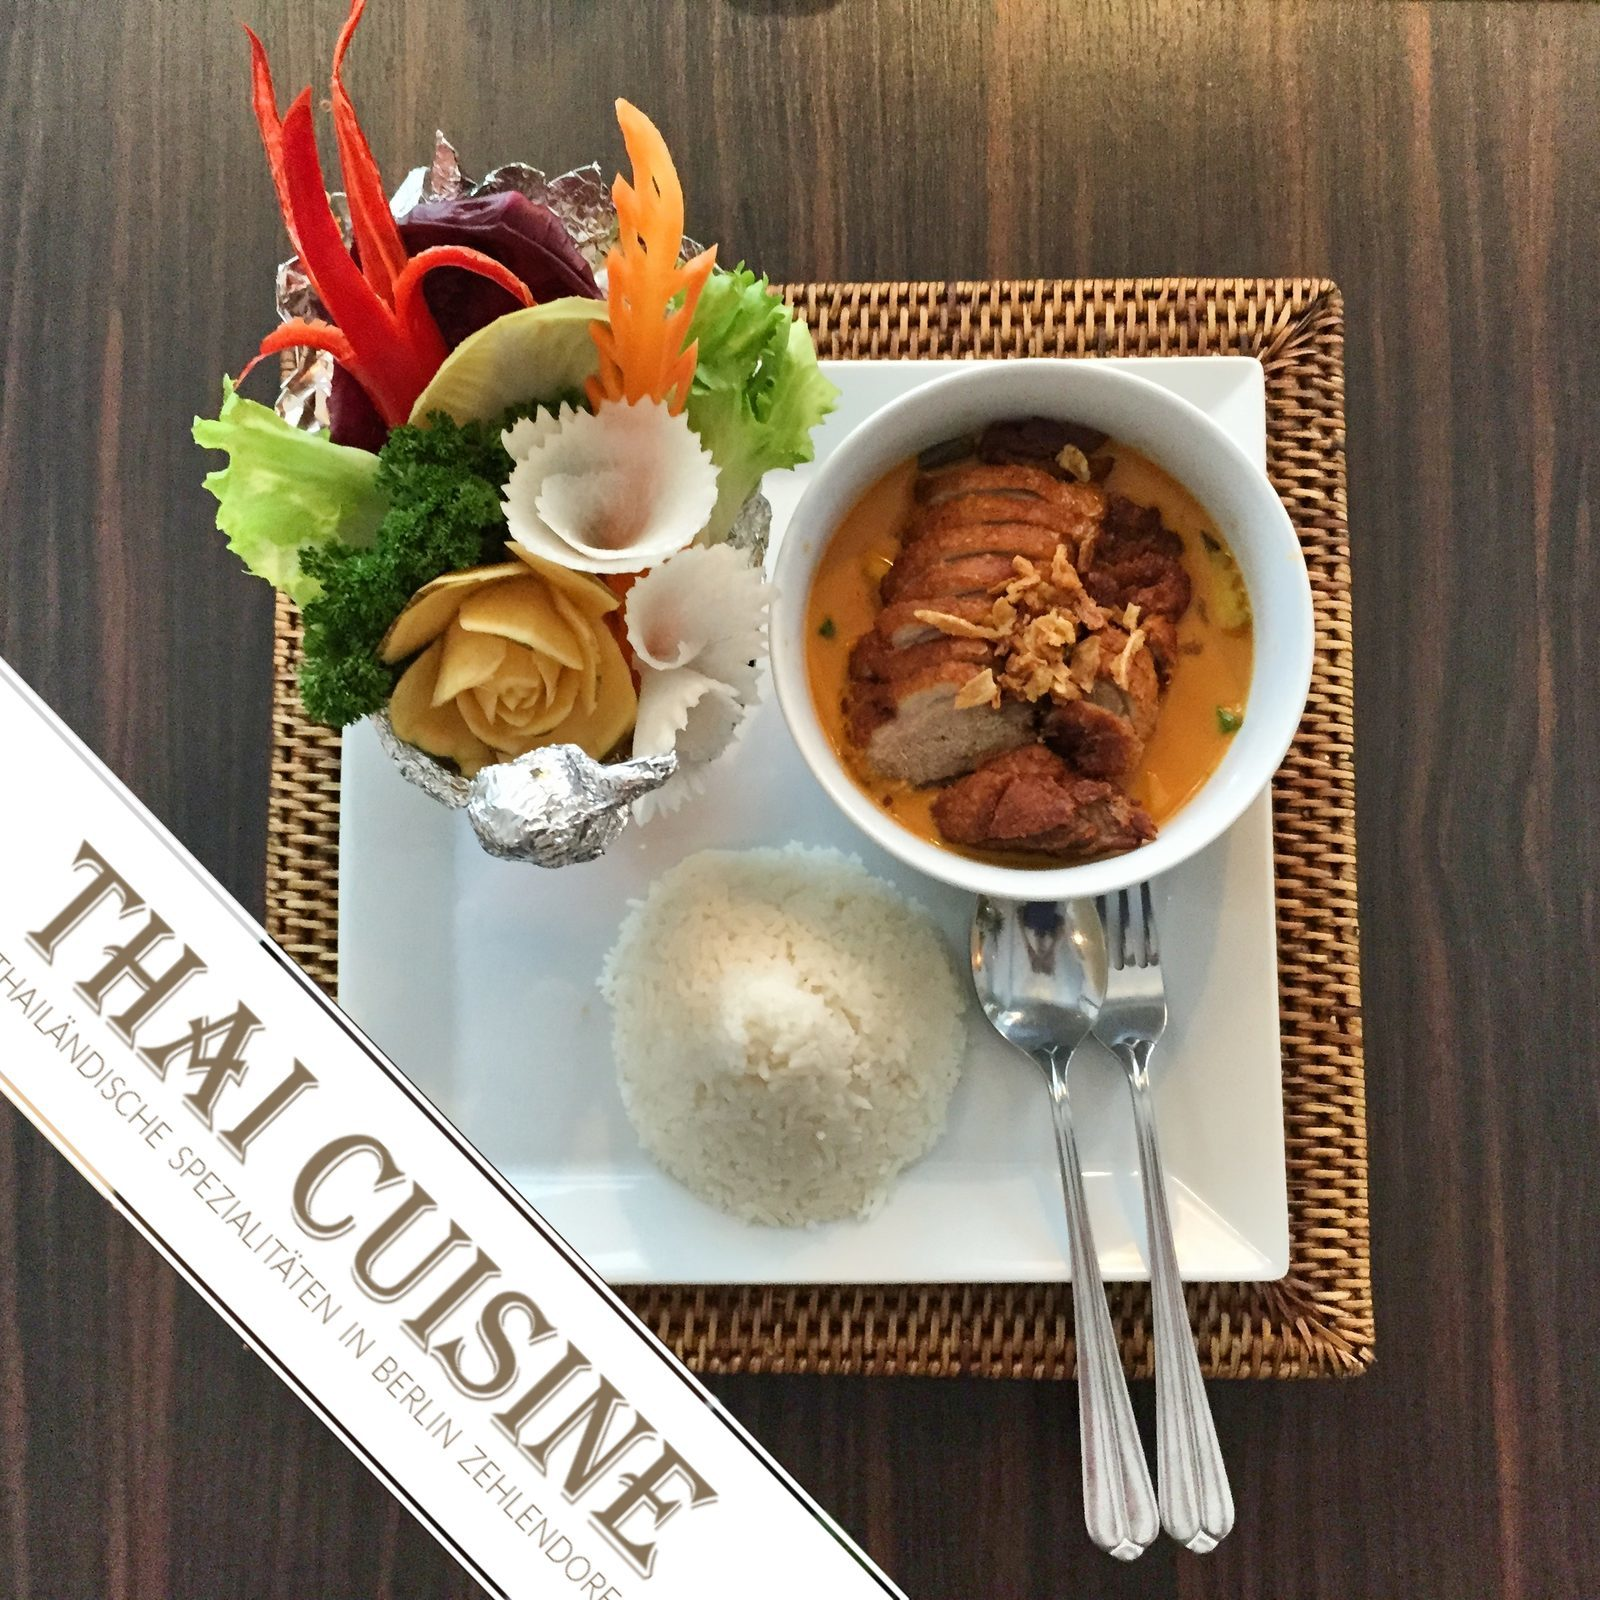 Thai Cuisine Berlin Zehlendorf - The Taste Of Thailand